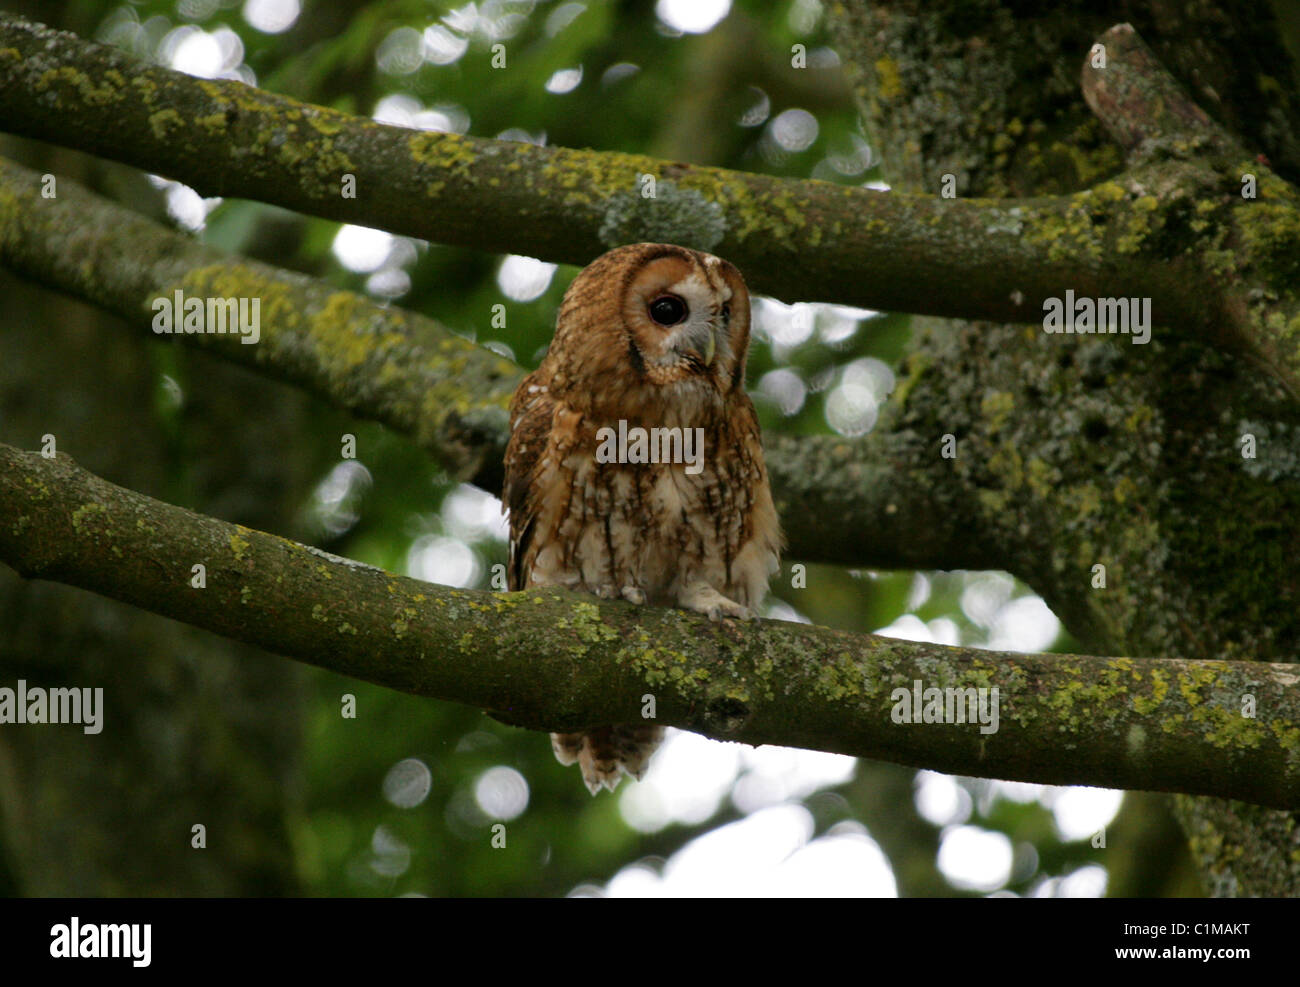 Tawny Owl or Wood Owl, Strix aluco sylvatica, Strigidae - Stock Image